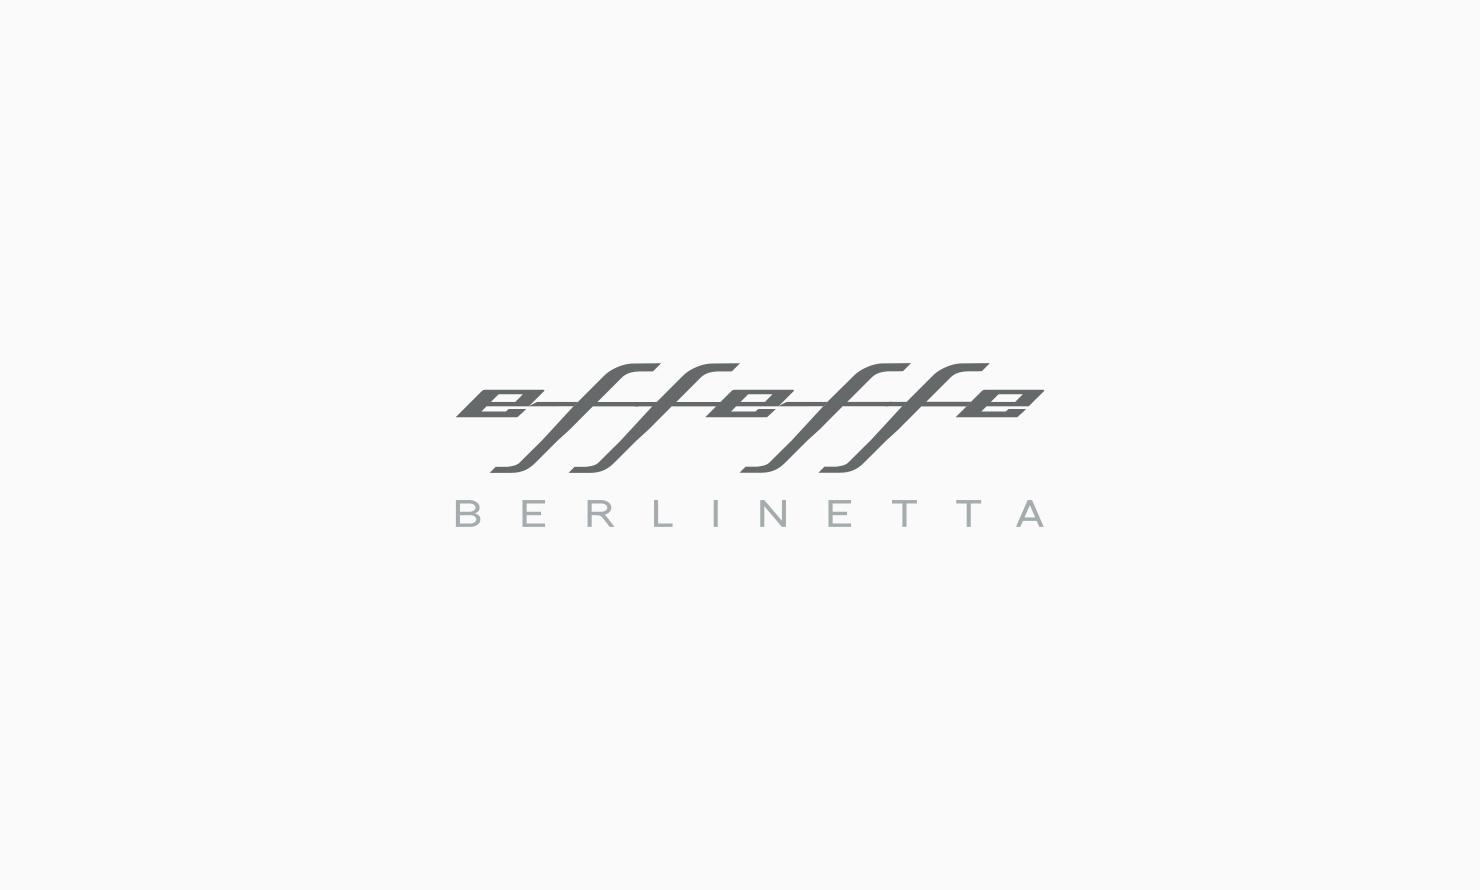 https://www.kubelibre.com/uploads/Slider-work-tutti-clienti/fratelli-frigerio-effeffe-berlinetta-un-auto-d-altri-tempi-costruita-oggi-1.jpg